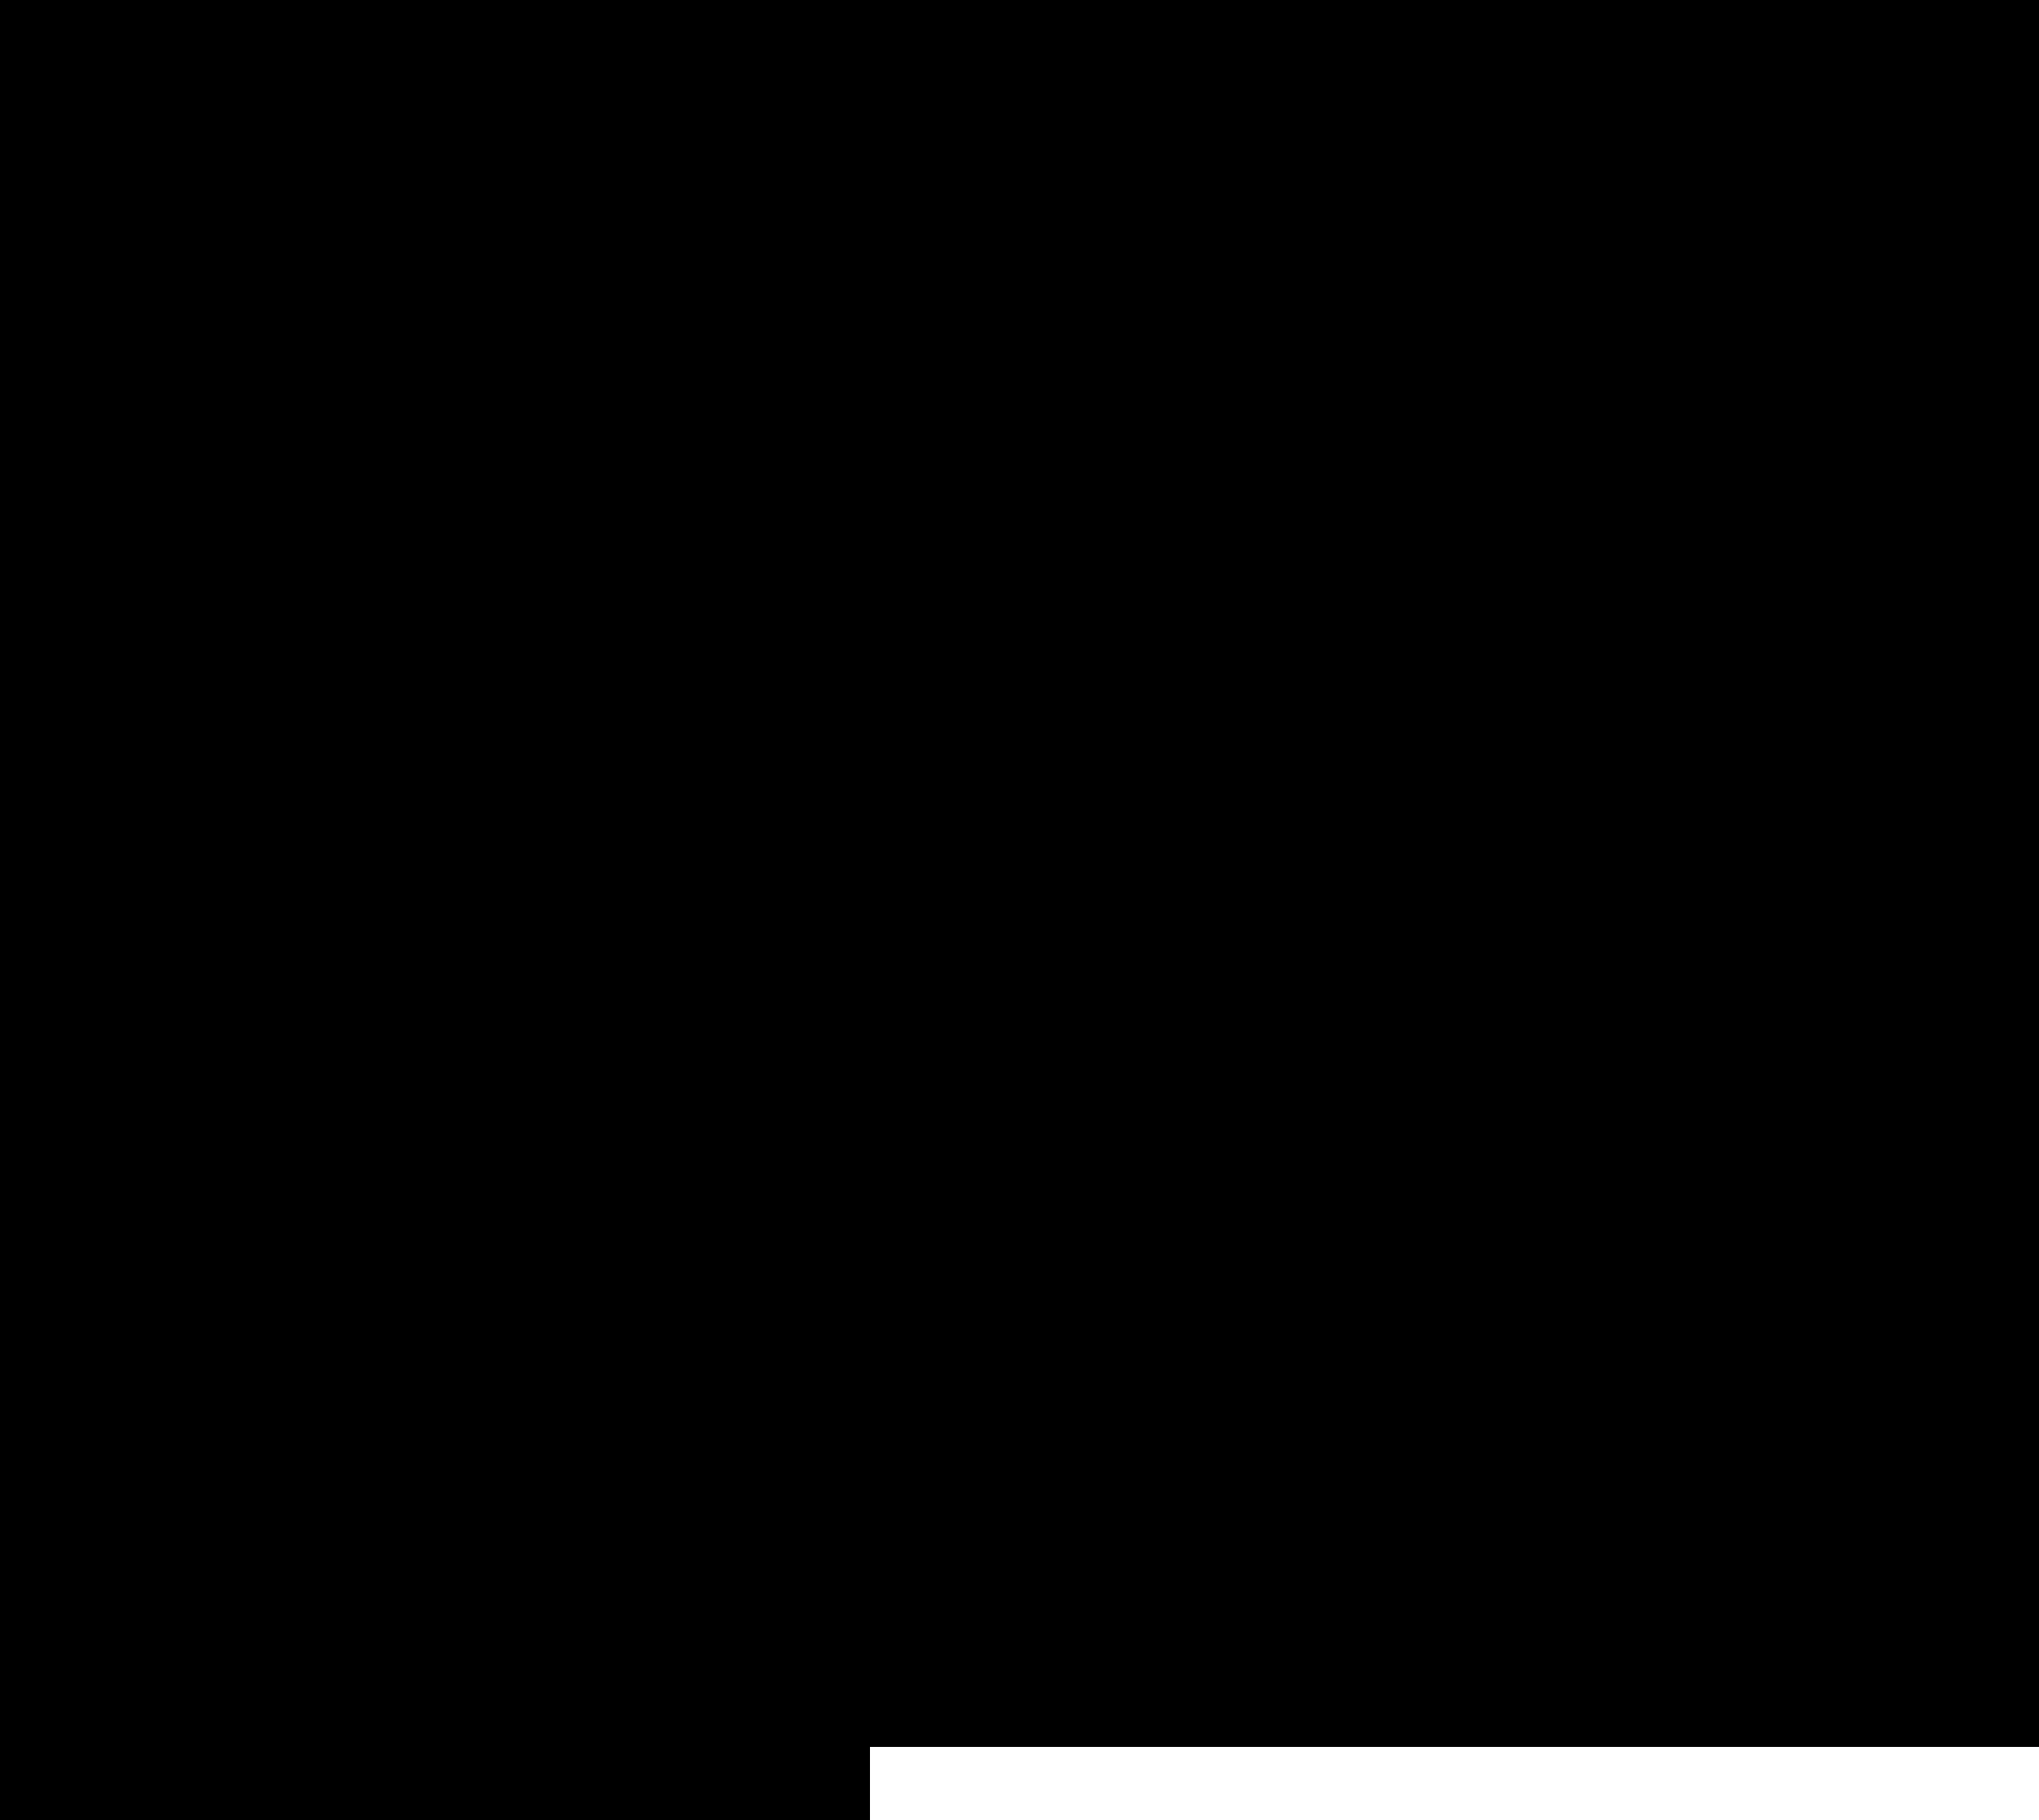 Taurus Bull Symbol Vector Clipart image.